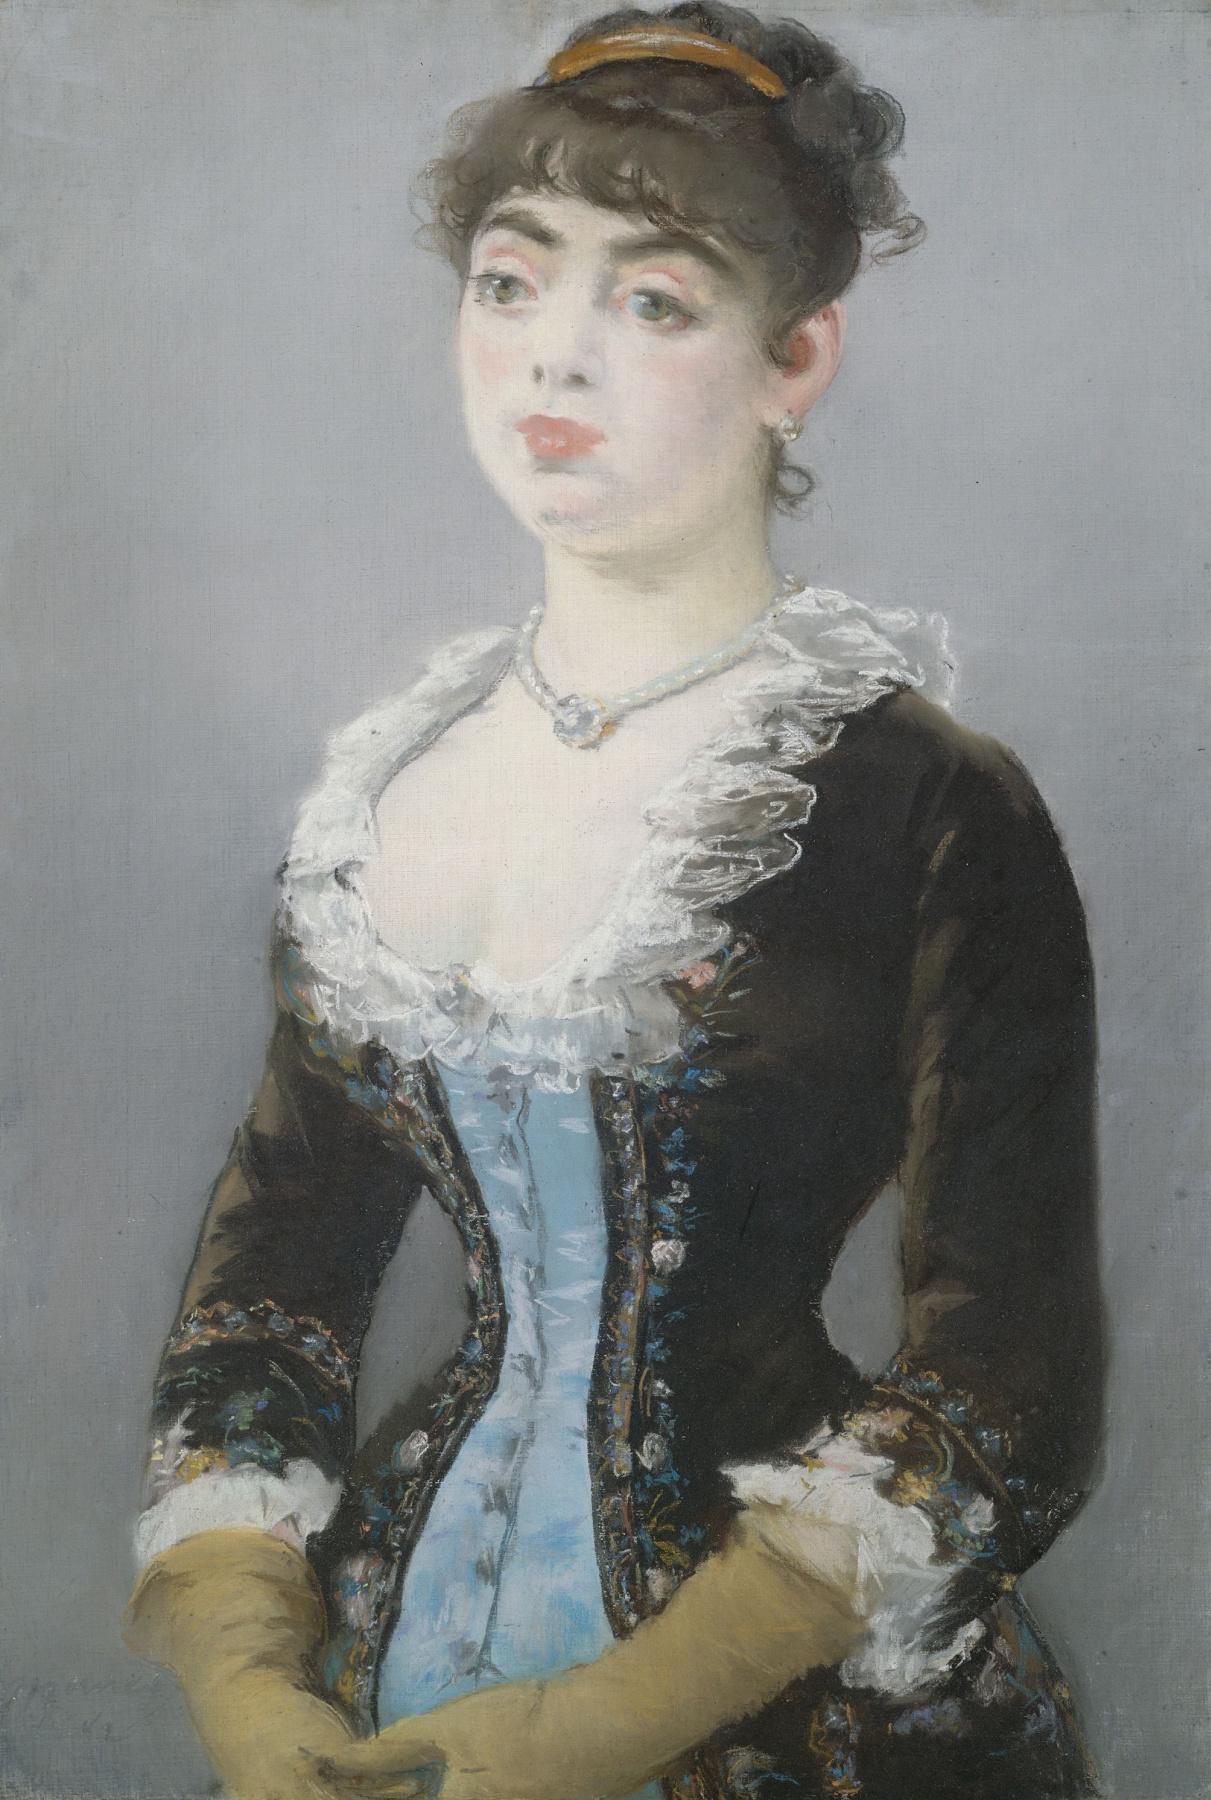 Edouard Manet. Portrait of Madame Michel-levy